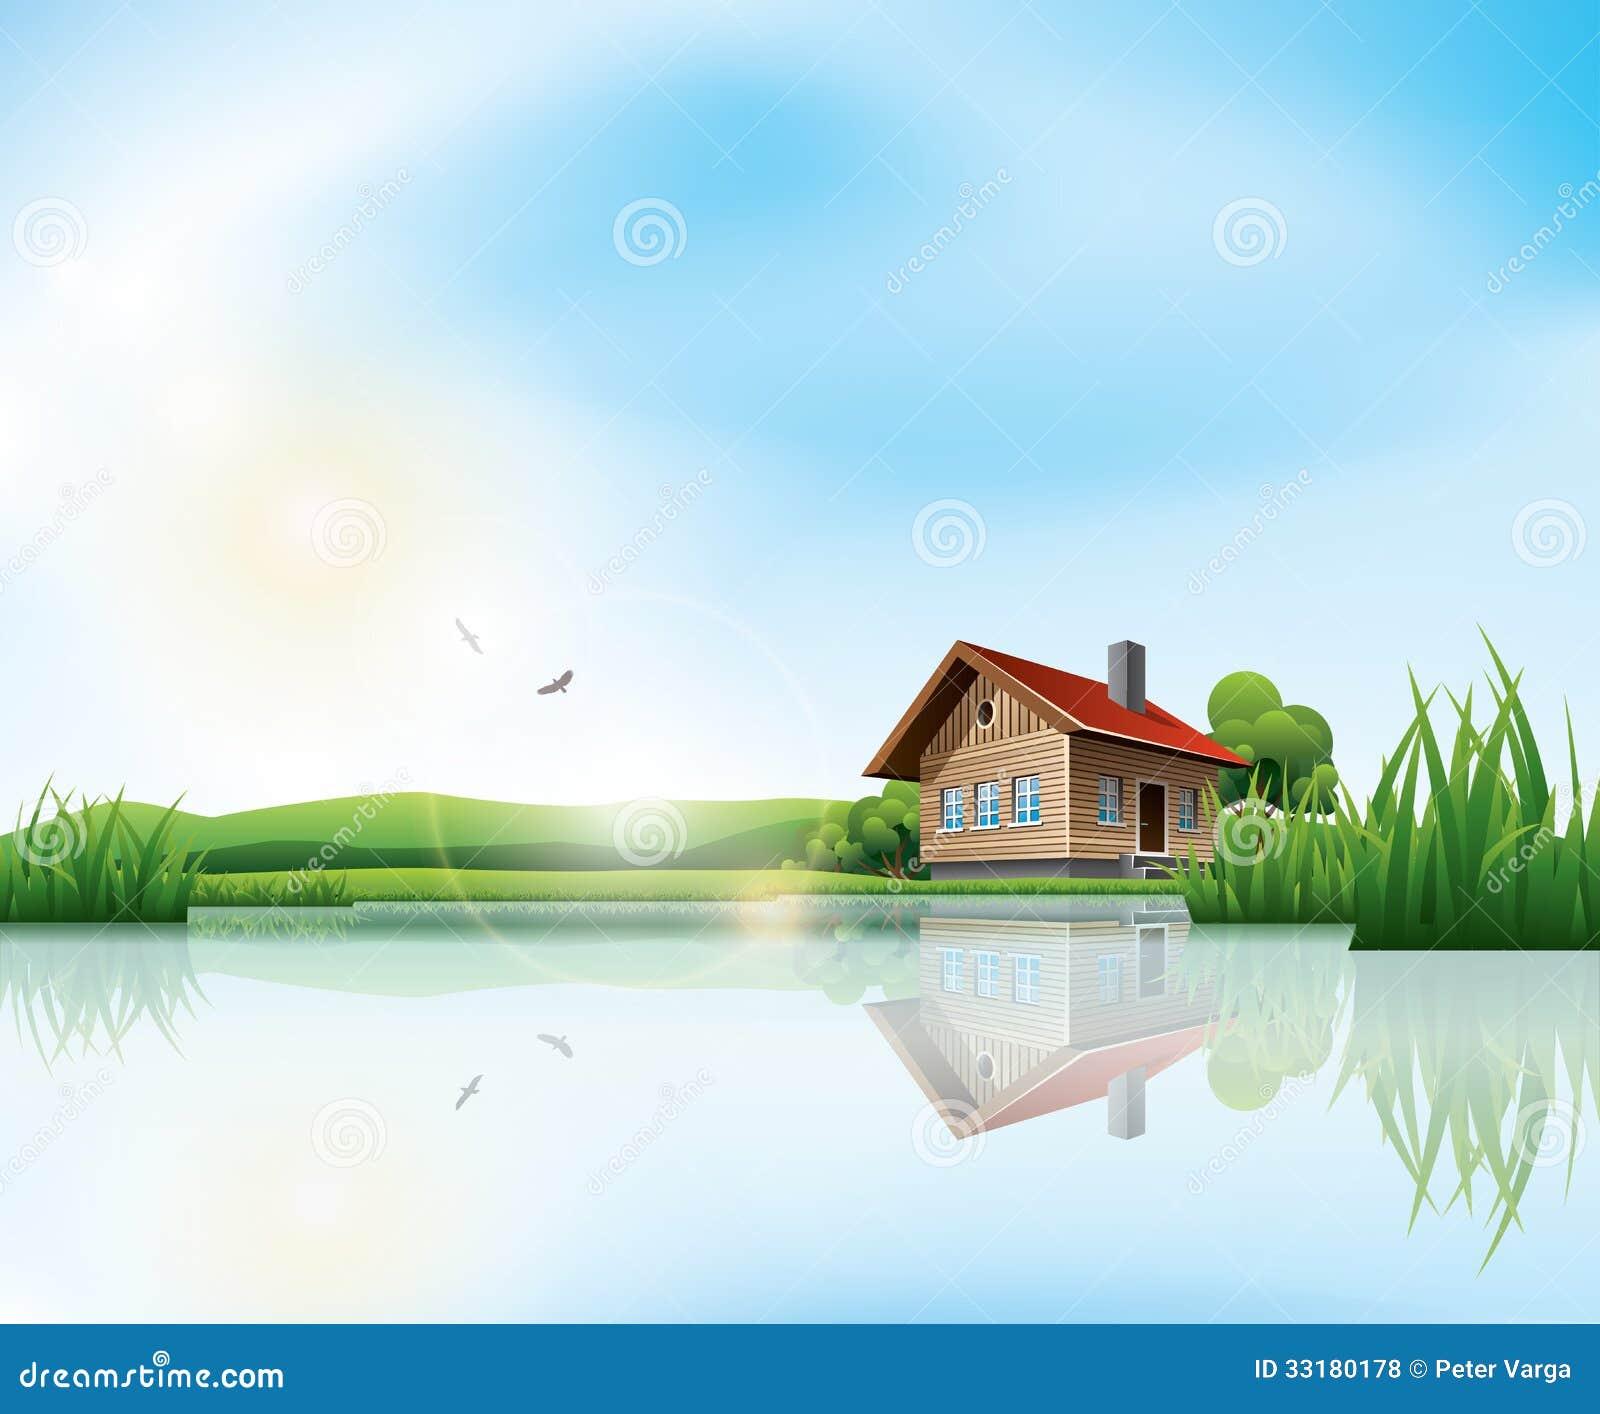 free clip art lake house - photo #22